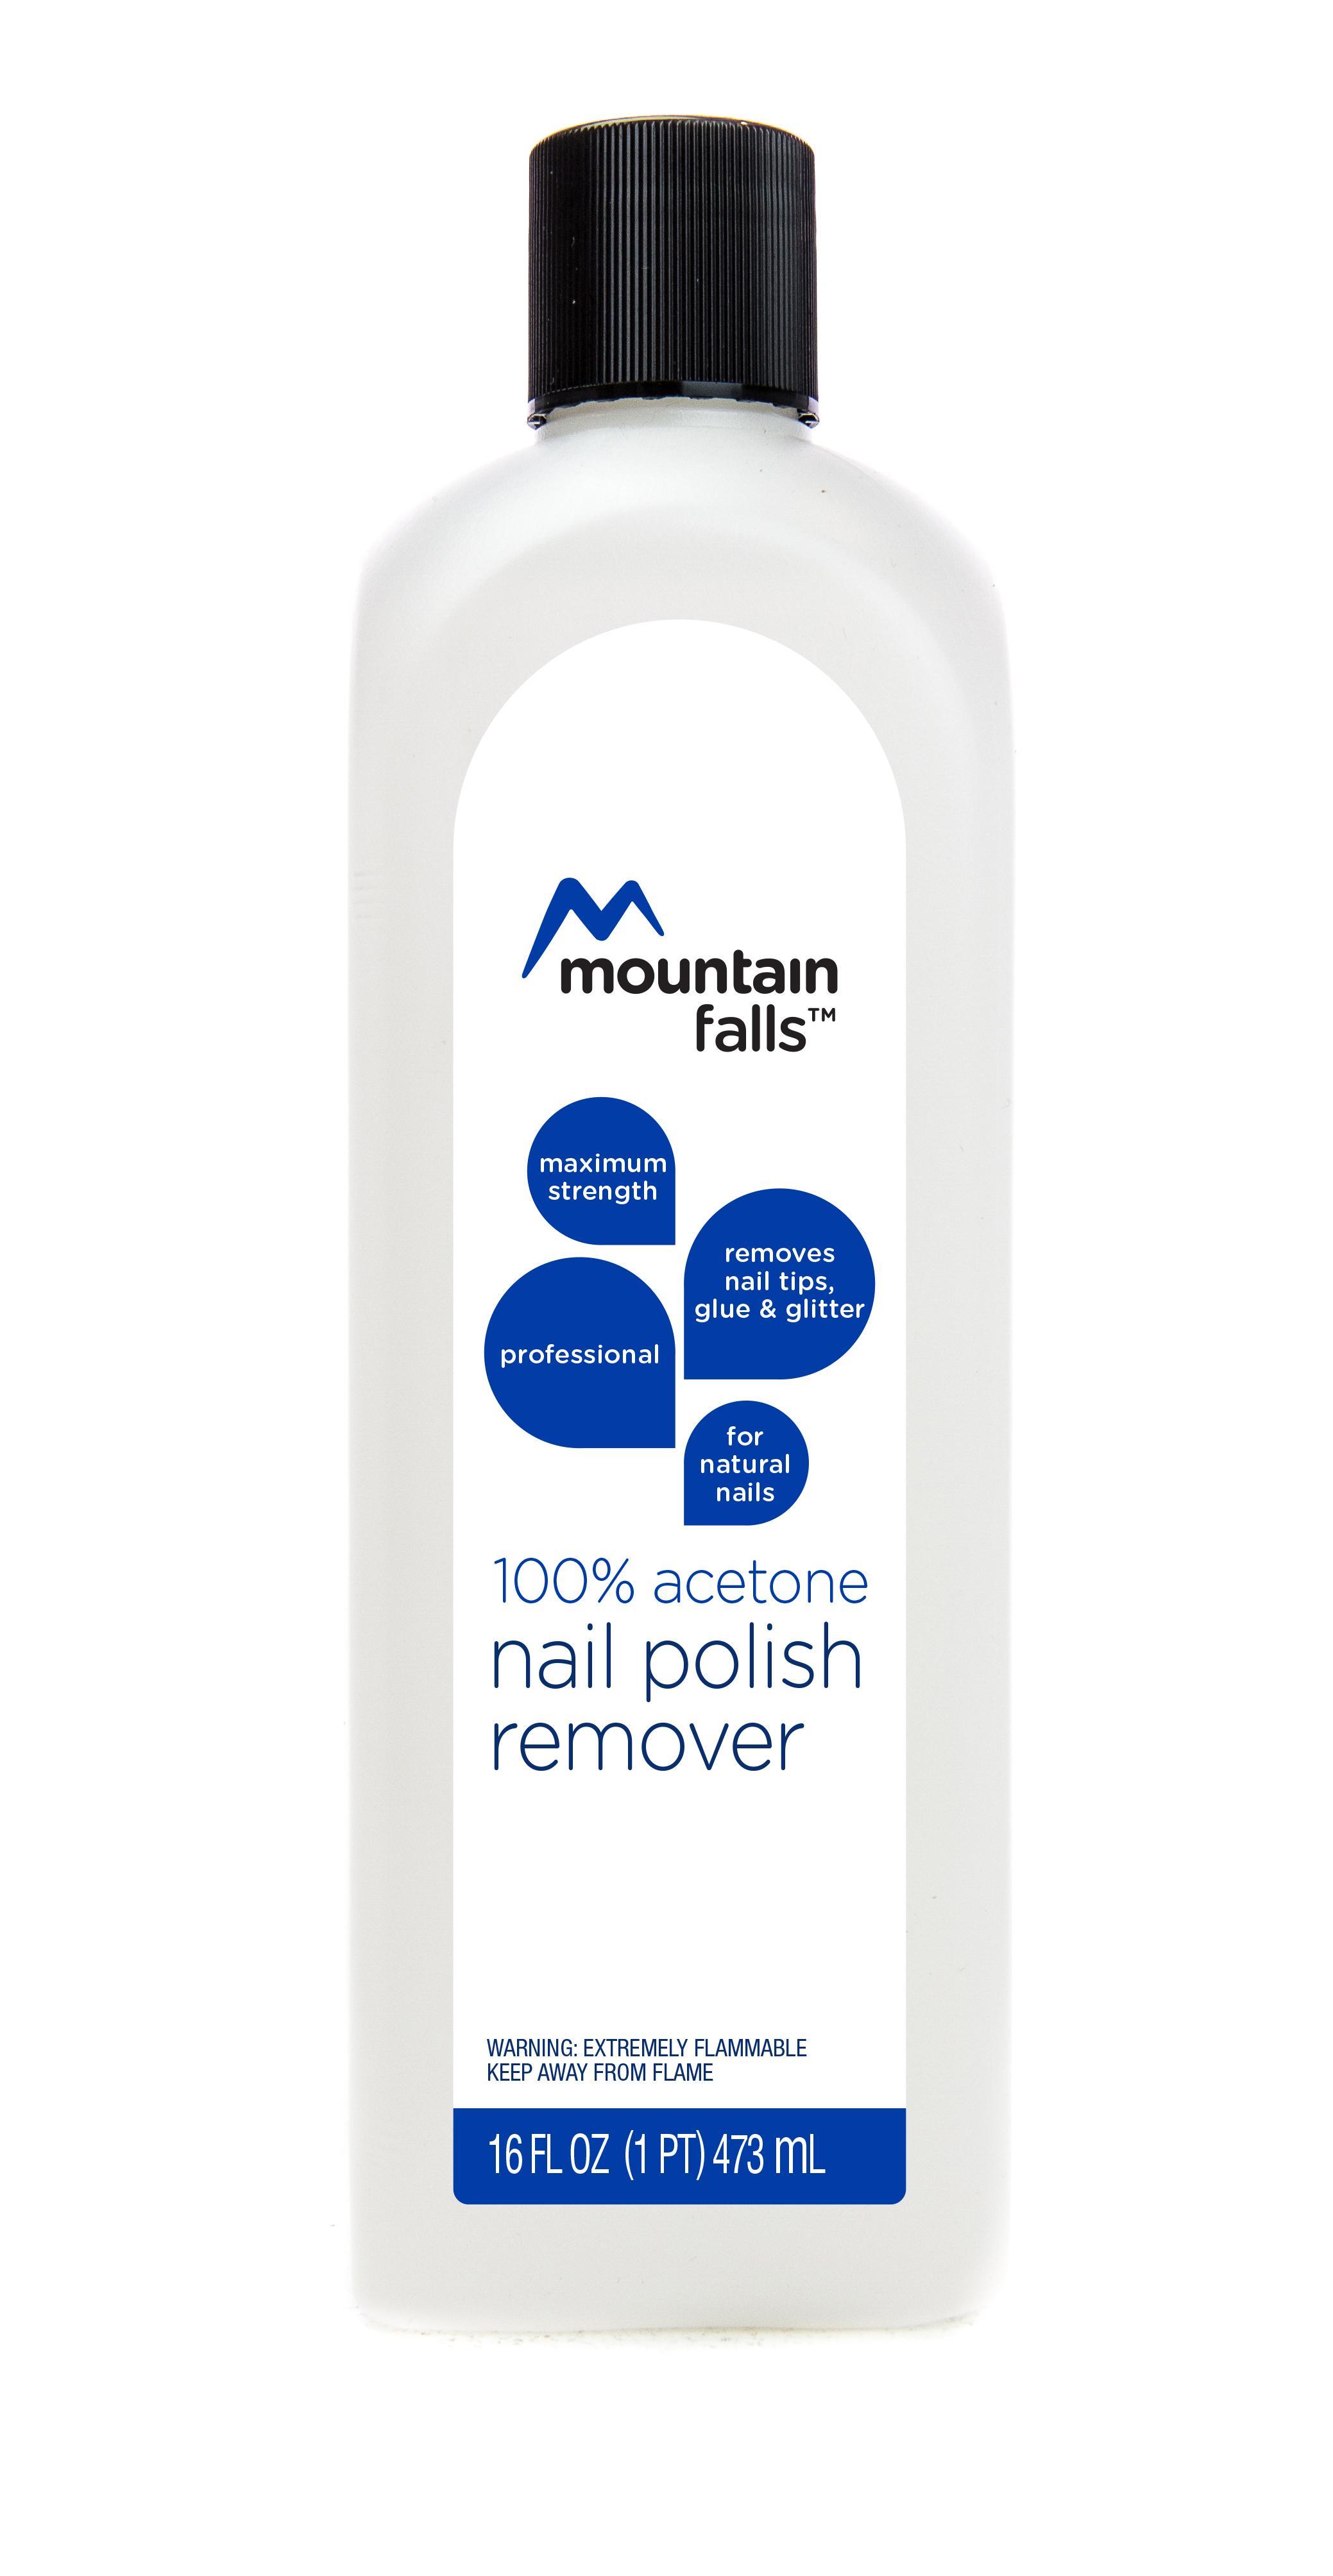 Amazon.com : Mountain Falls 100% Acetone Nail Polish Remover for ...